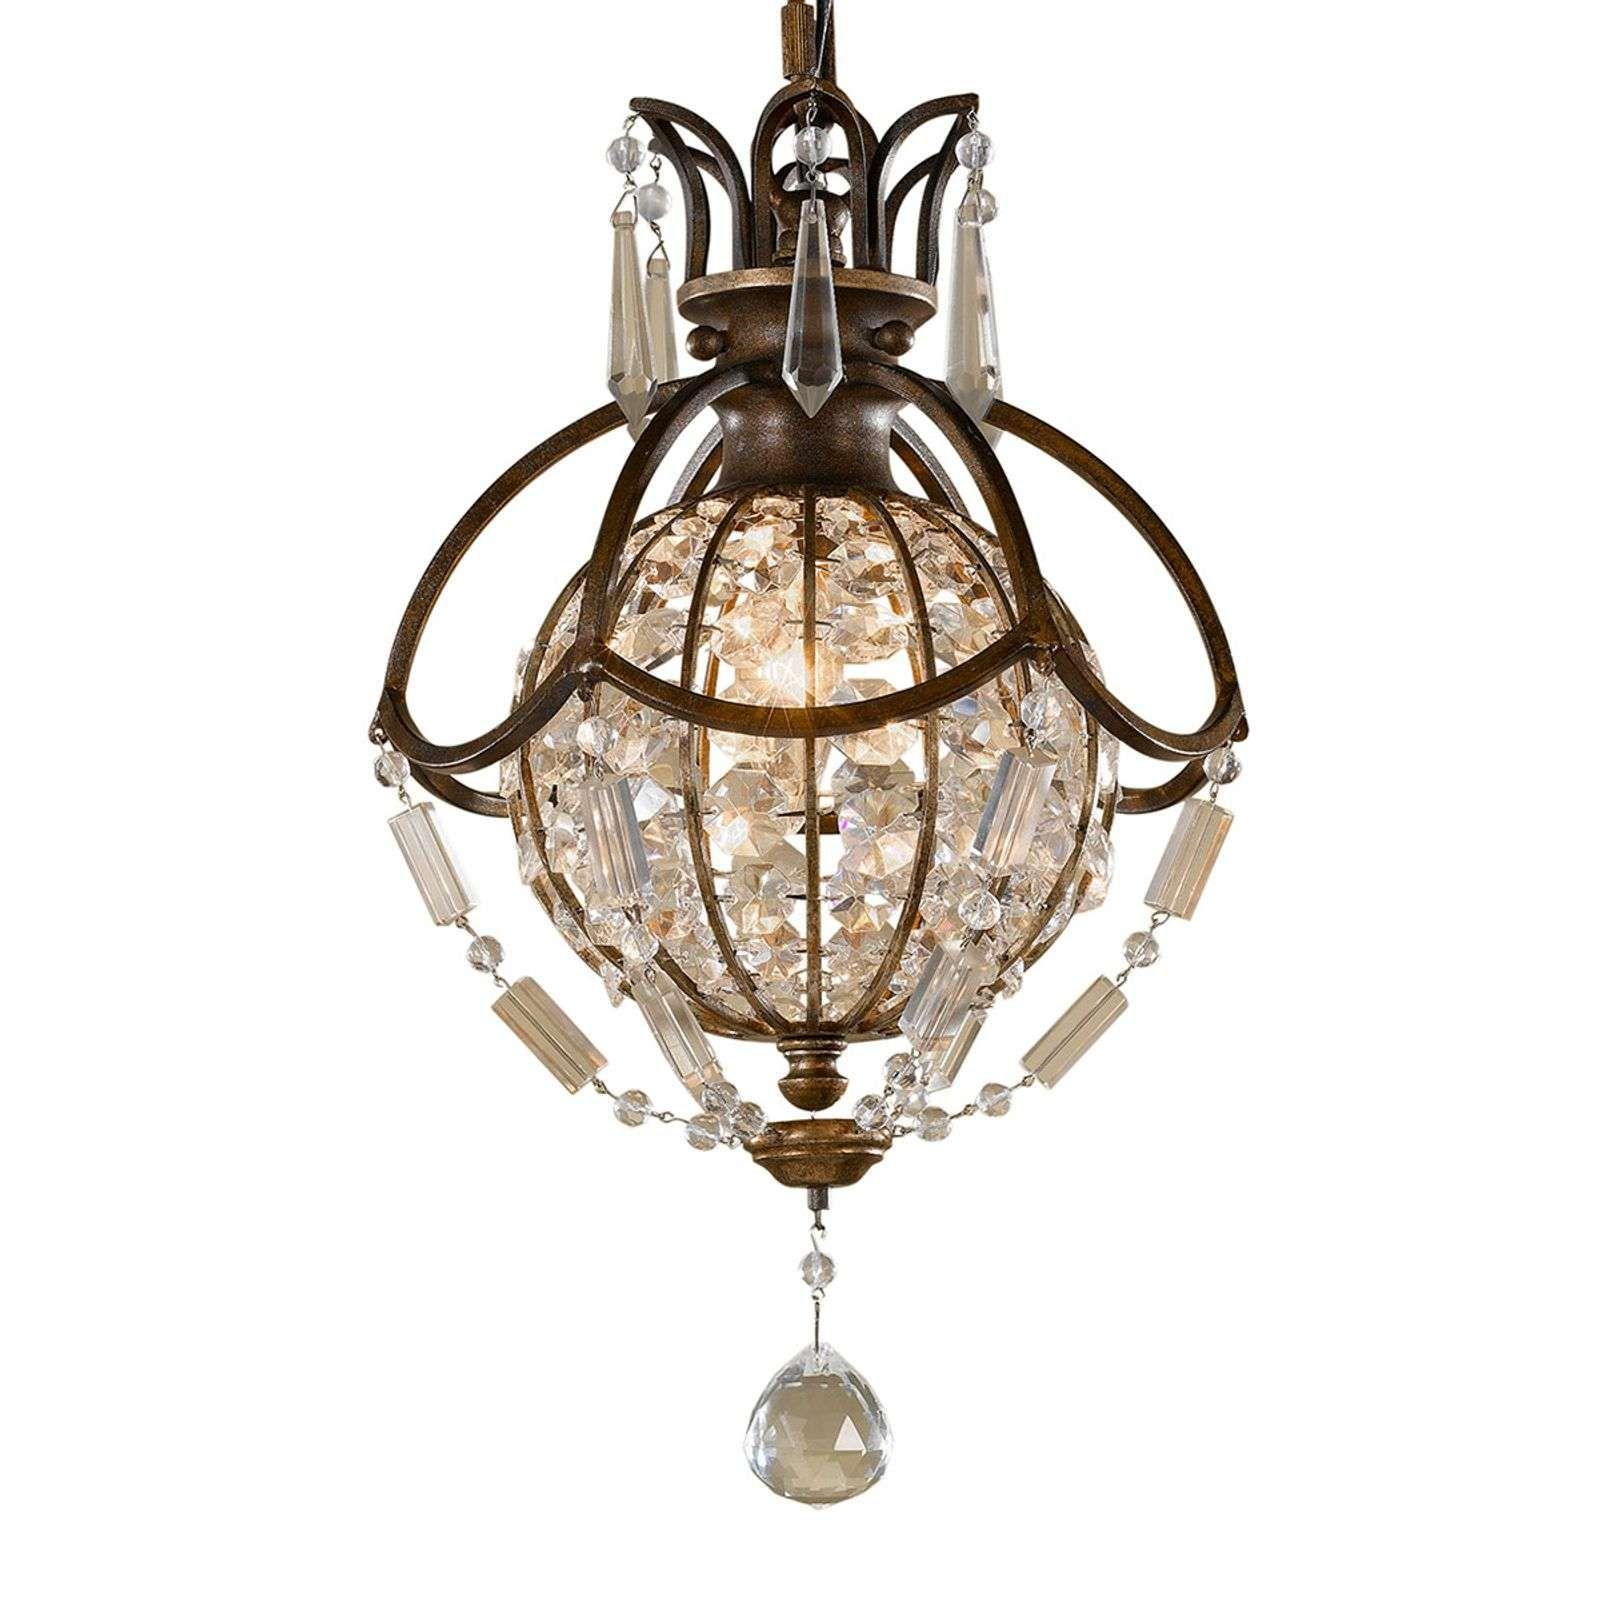 Jolie Suspension Bellini Hangeleuchte Bellini Kristall Lampe